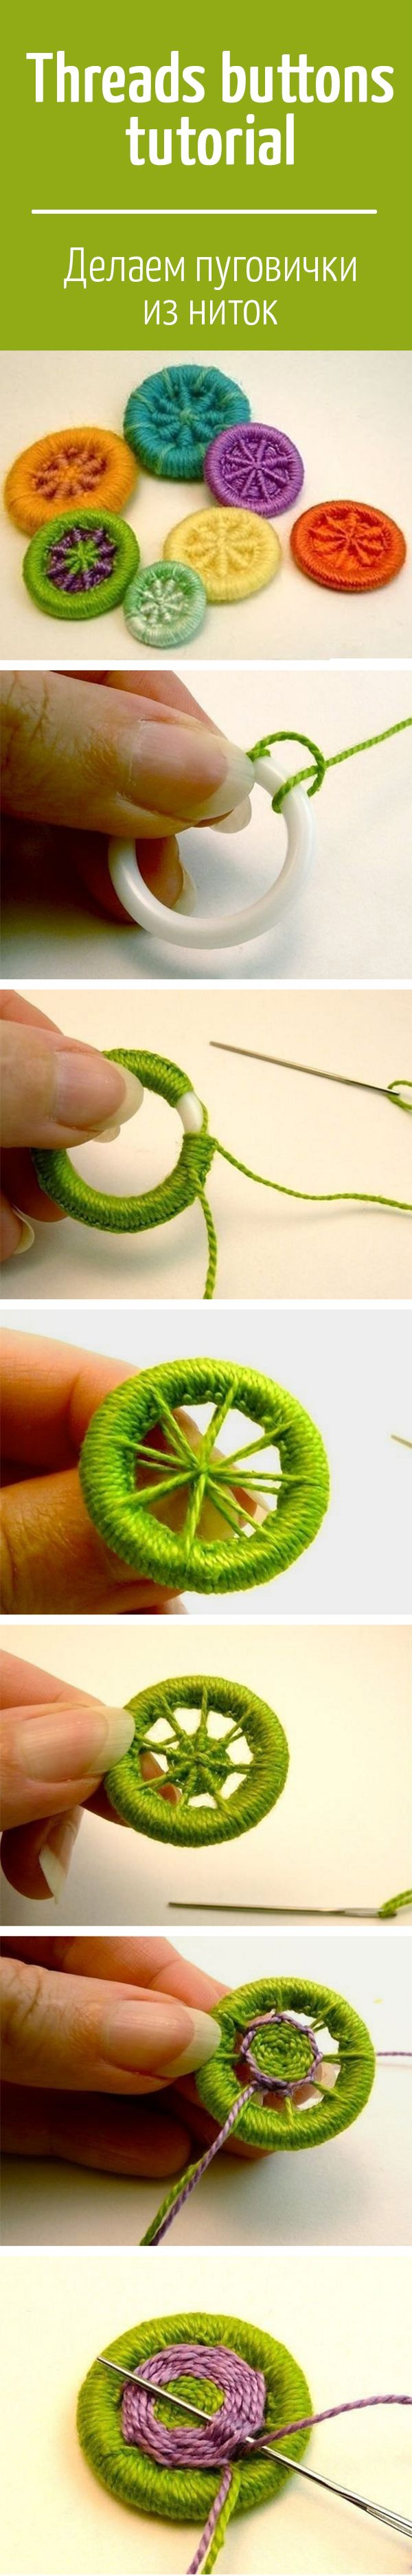 Threads buttons tutorial / Делаем пуговички из ниток